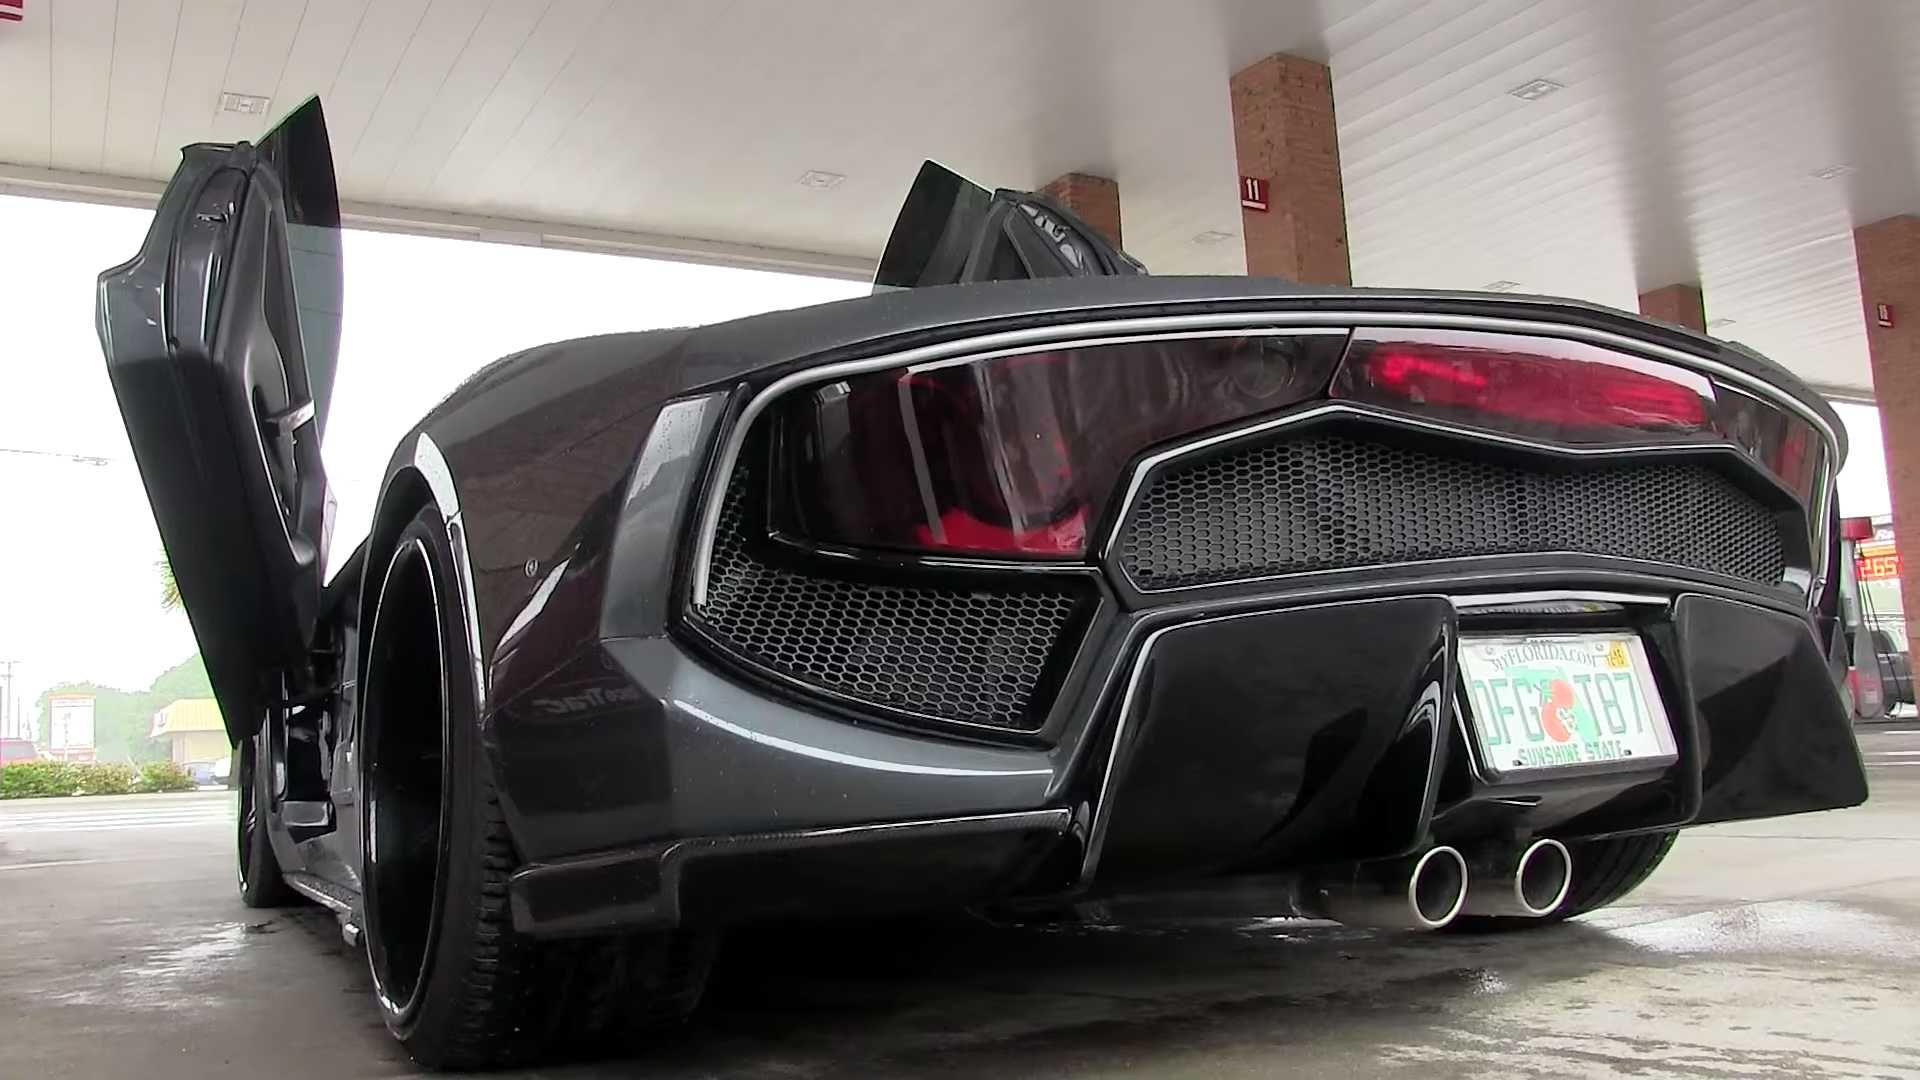 Vaydor 35 Infinity G35 As The Donor Car Full Kit Under 25 000 Super Cars Kit Cars Replica Replica Cars